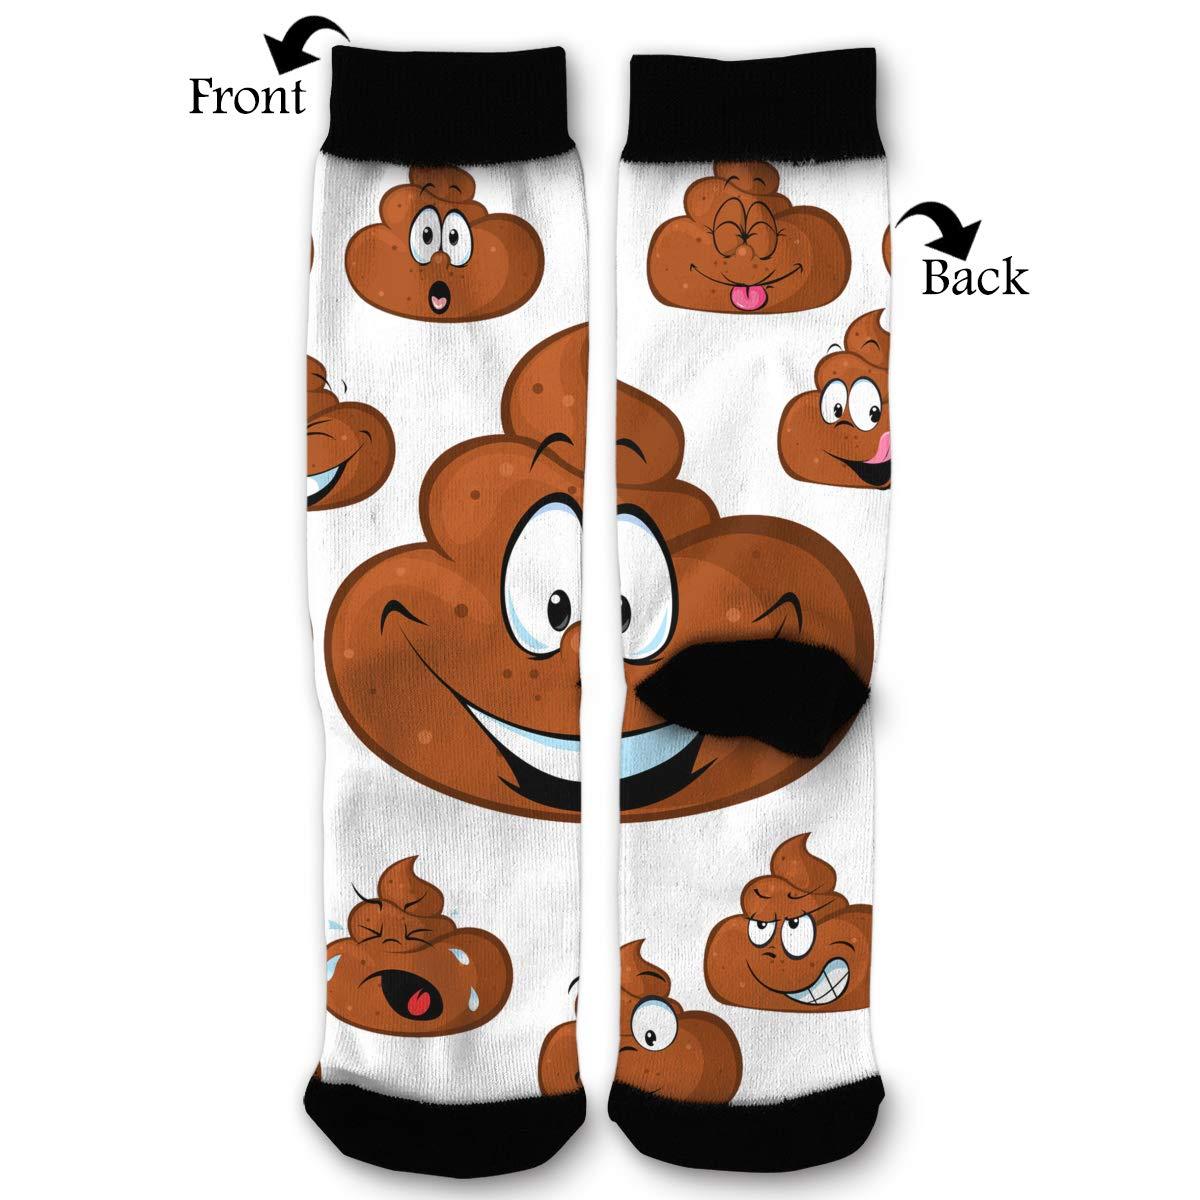 ec2ad1c2de16 Funny Poop Crew Socks - Fun Novelty Socks - Unisex, One Size Fits Most at  Amazon Women's Clothing store: